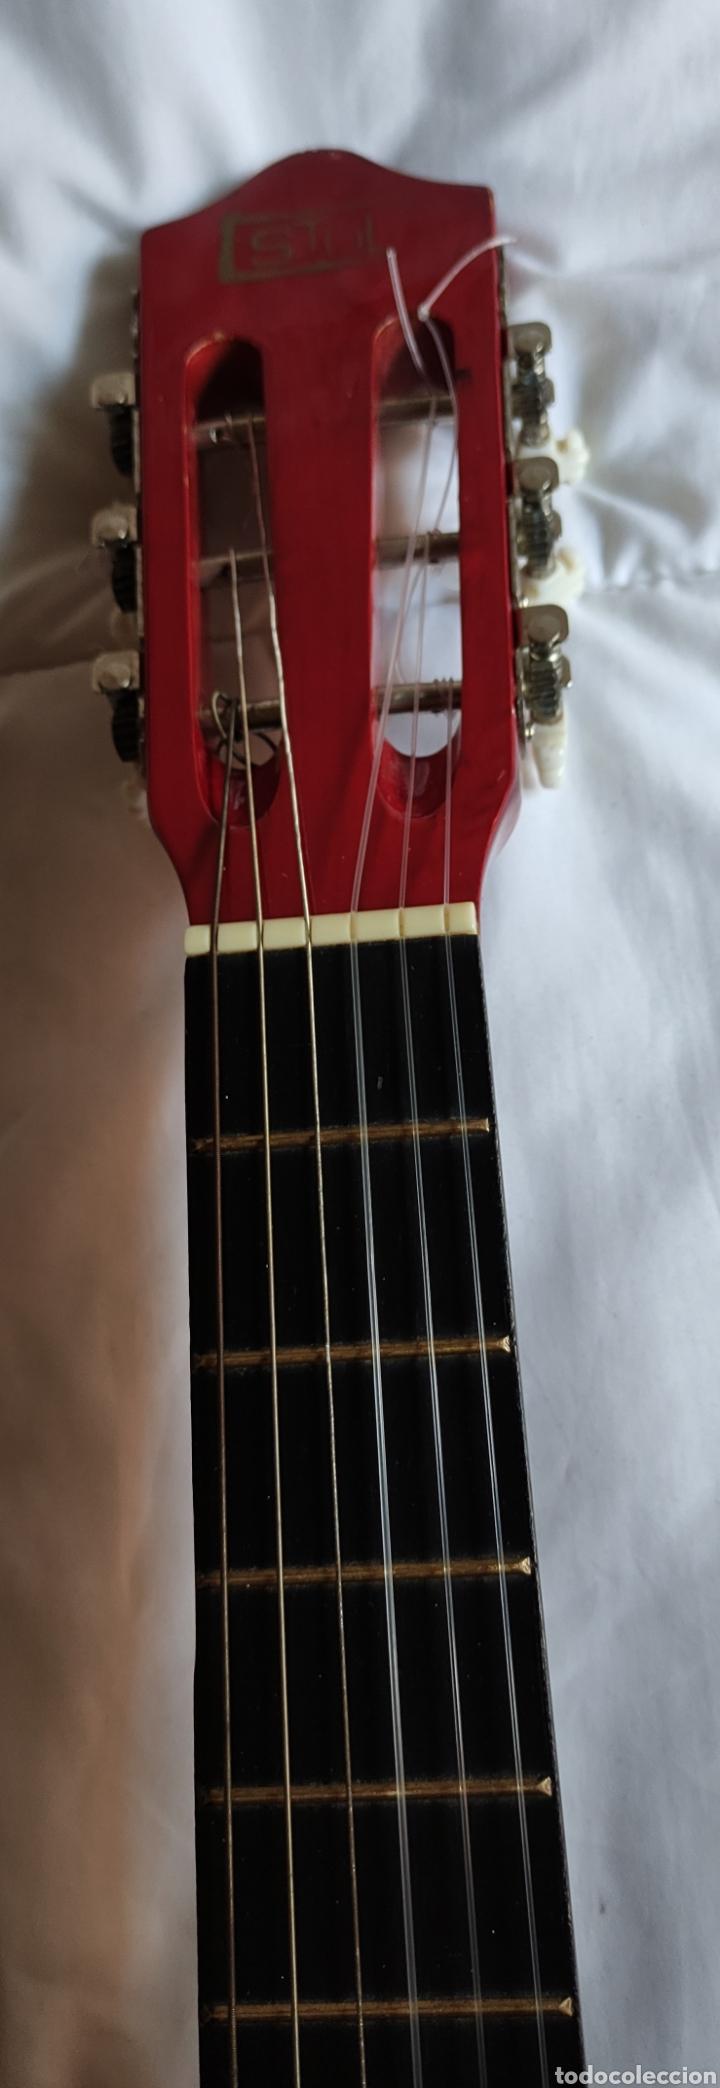 Instrumentos musicales: Guitarra - Foto 18 - 228417015